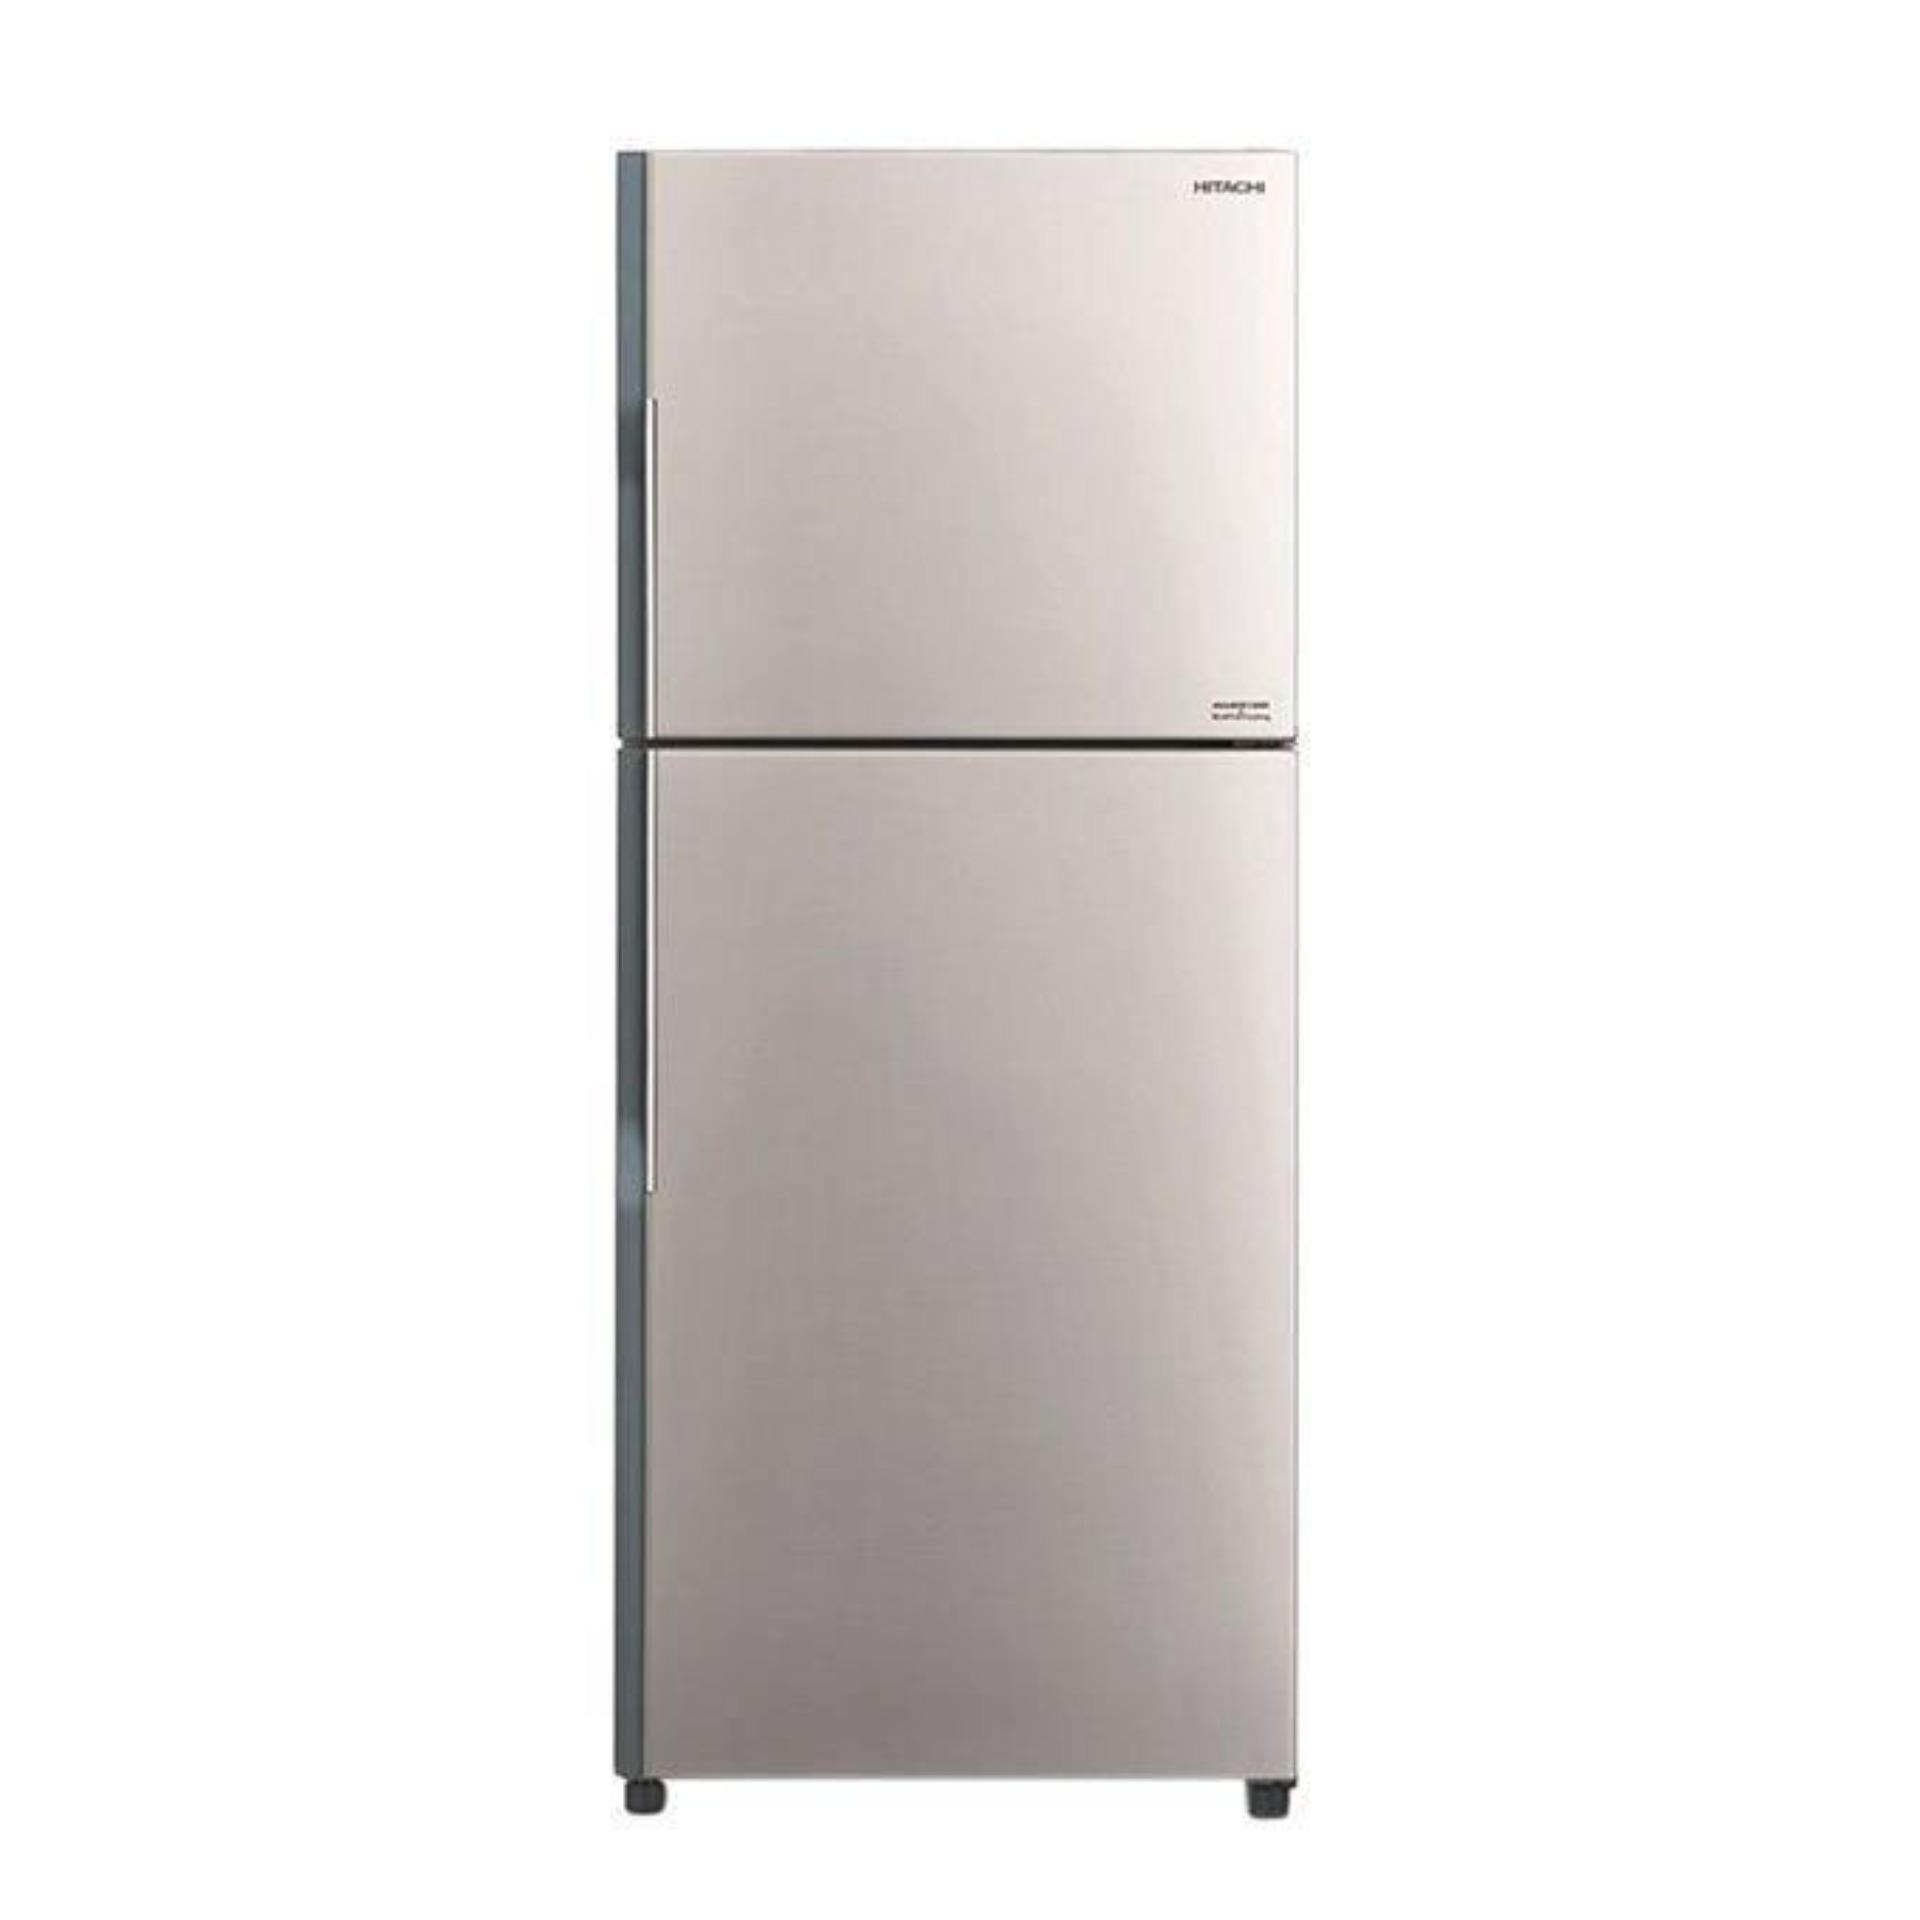 R-V410P3MS-SLS Top Mount Refrigerator 335L - Silver